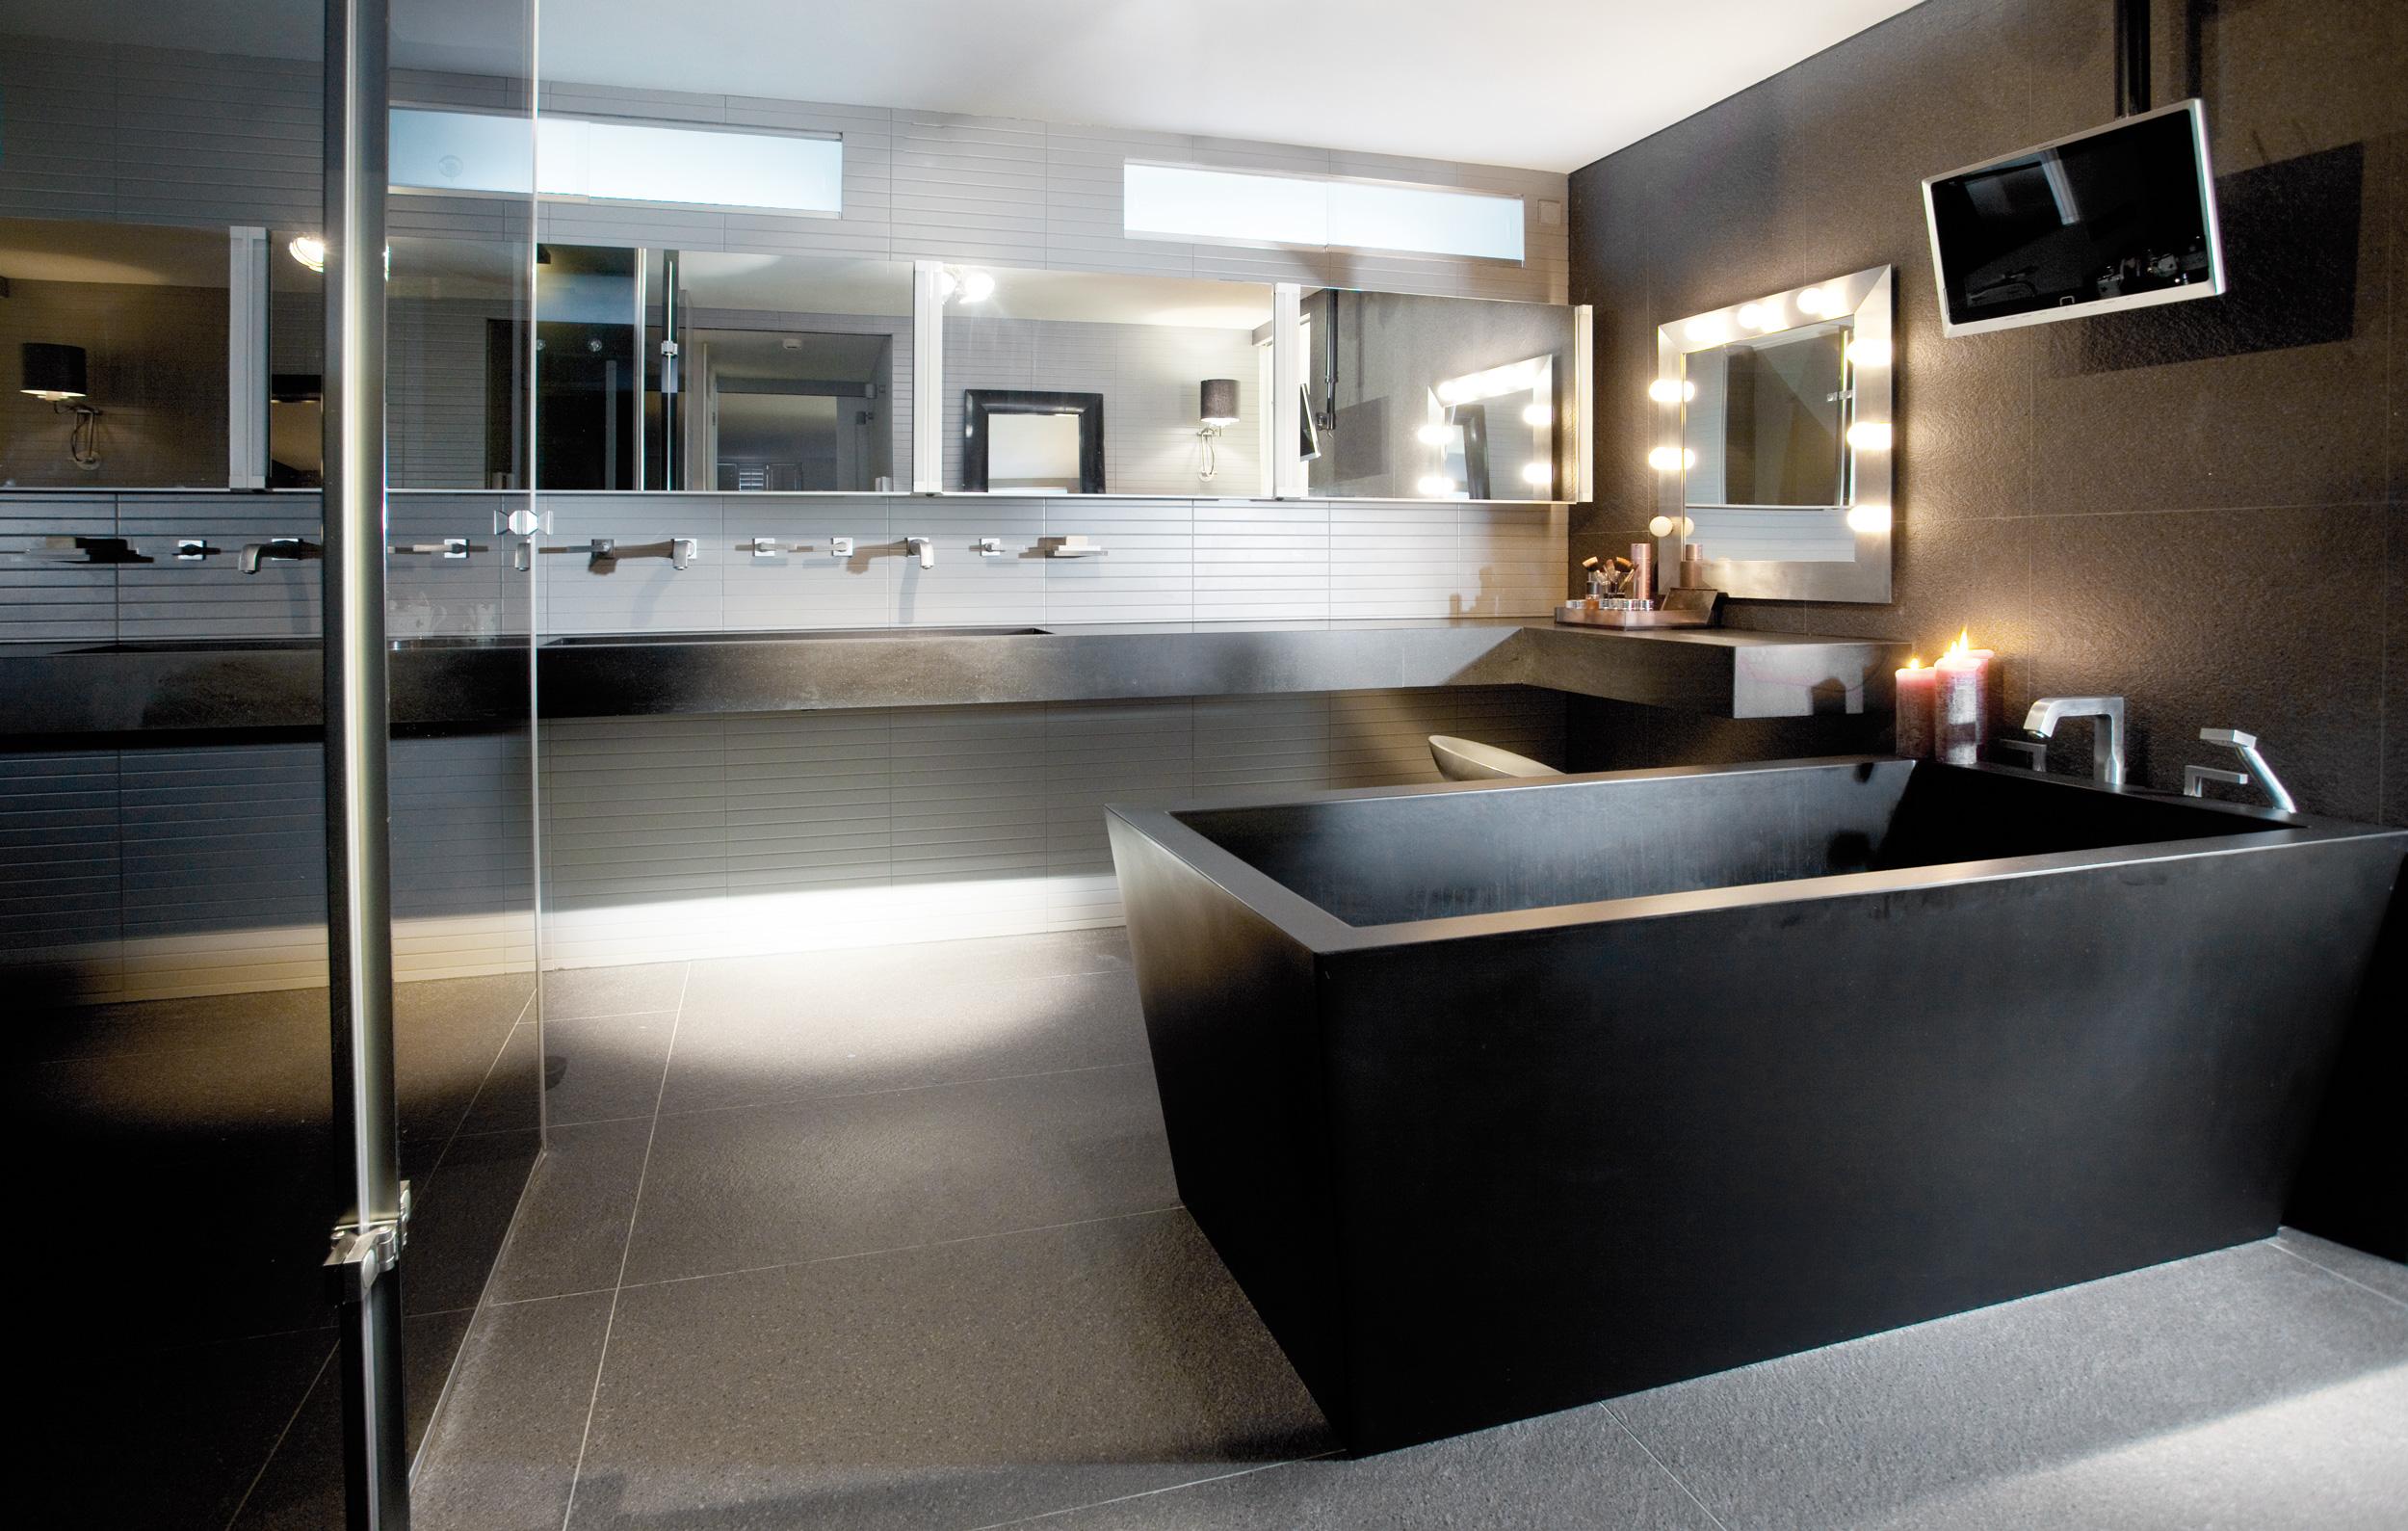 Penthouse Amsterdam - Sjartec - Badkamers, Wellness en Tegels in Leiden